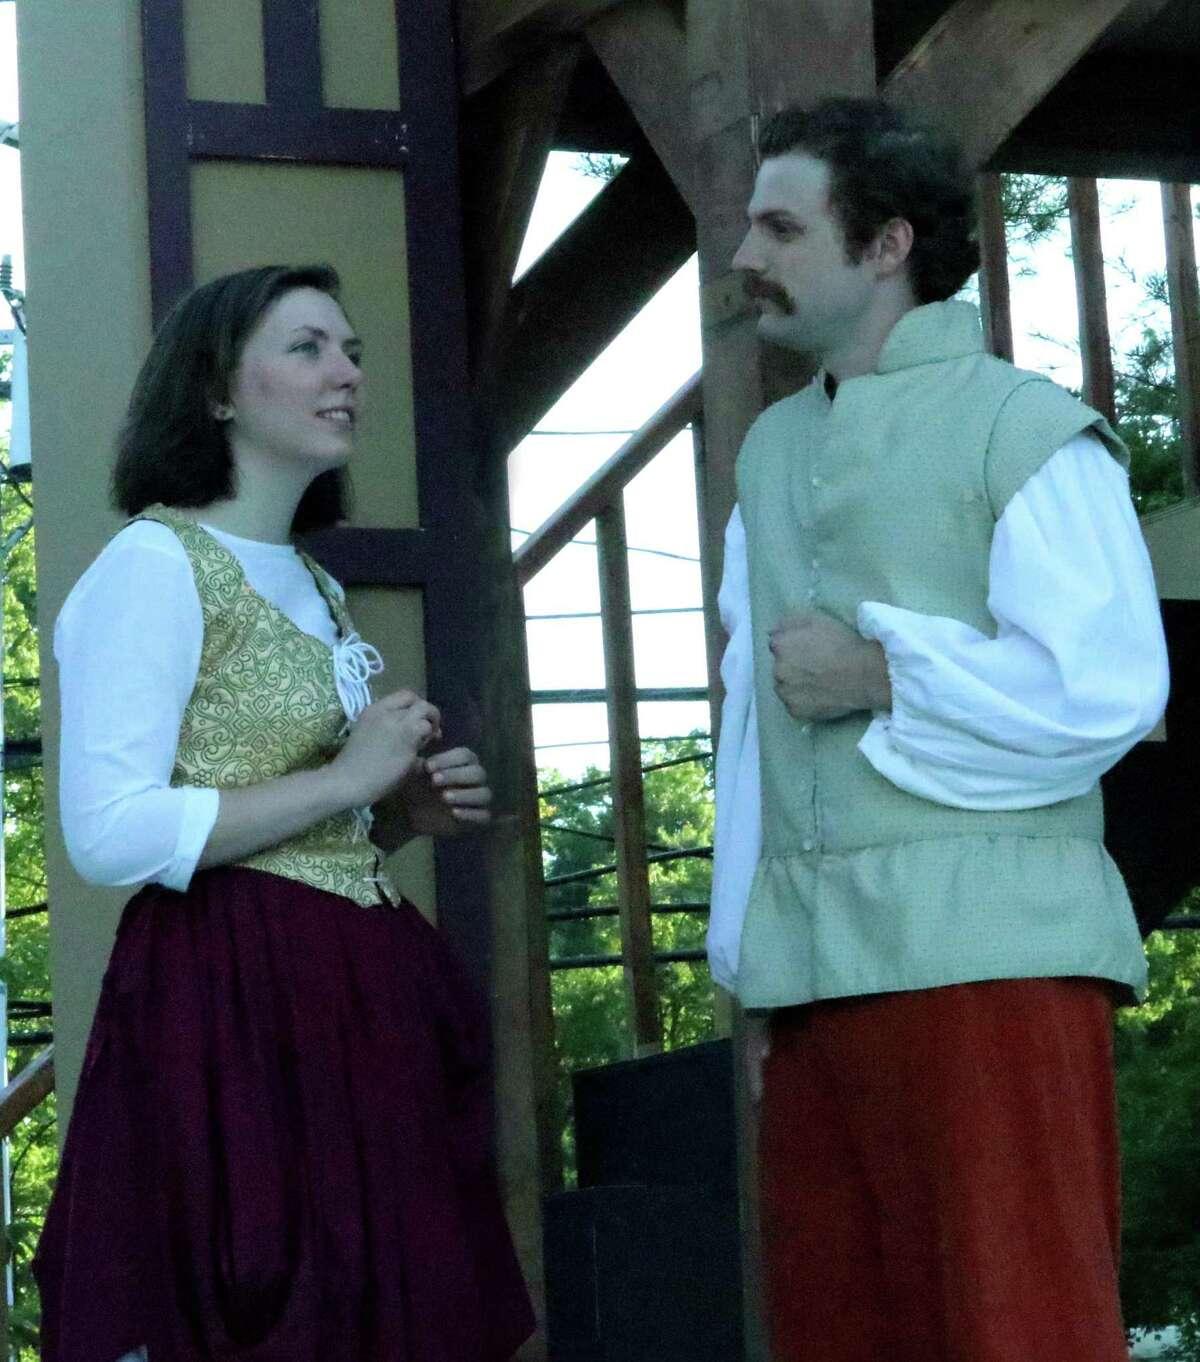 In Shakespeare's